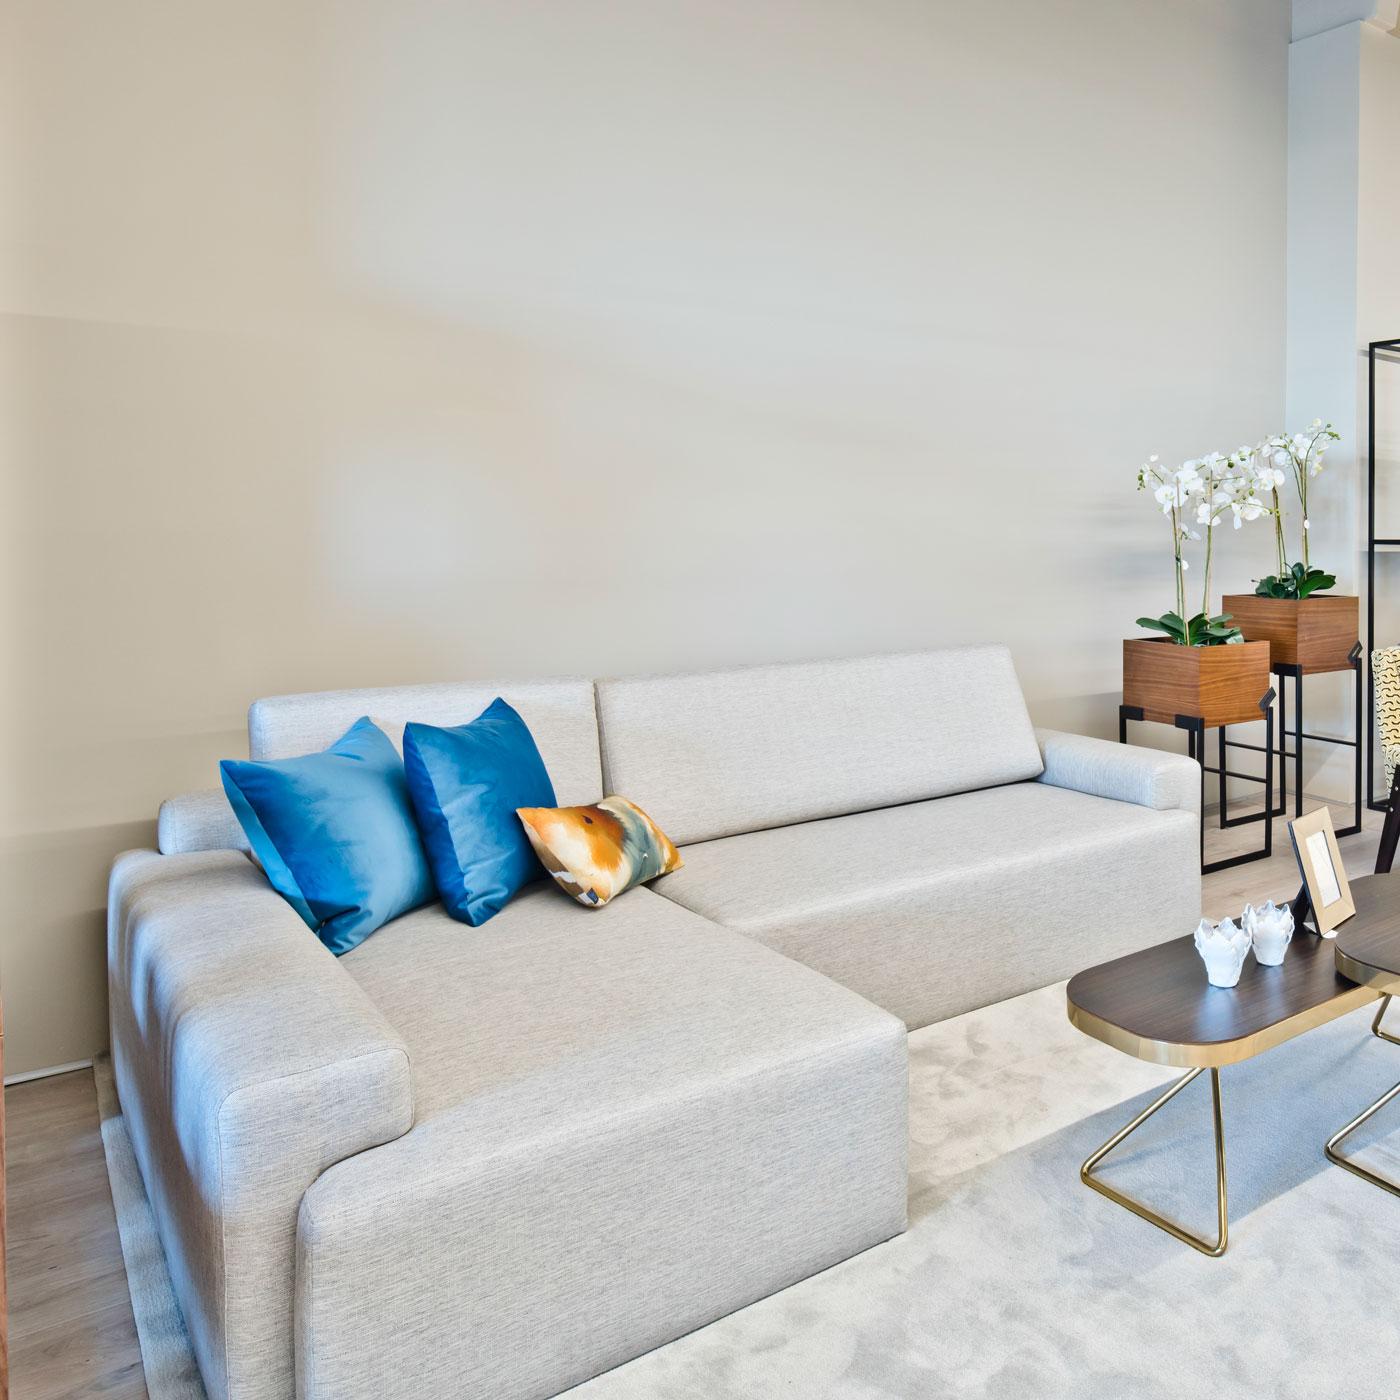 Sofa brad chaise - promoçoes escaldantes - domkapa